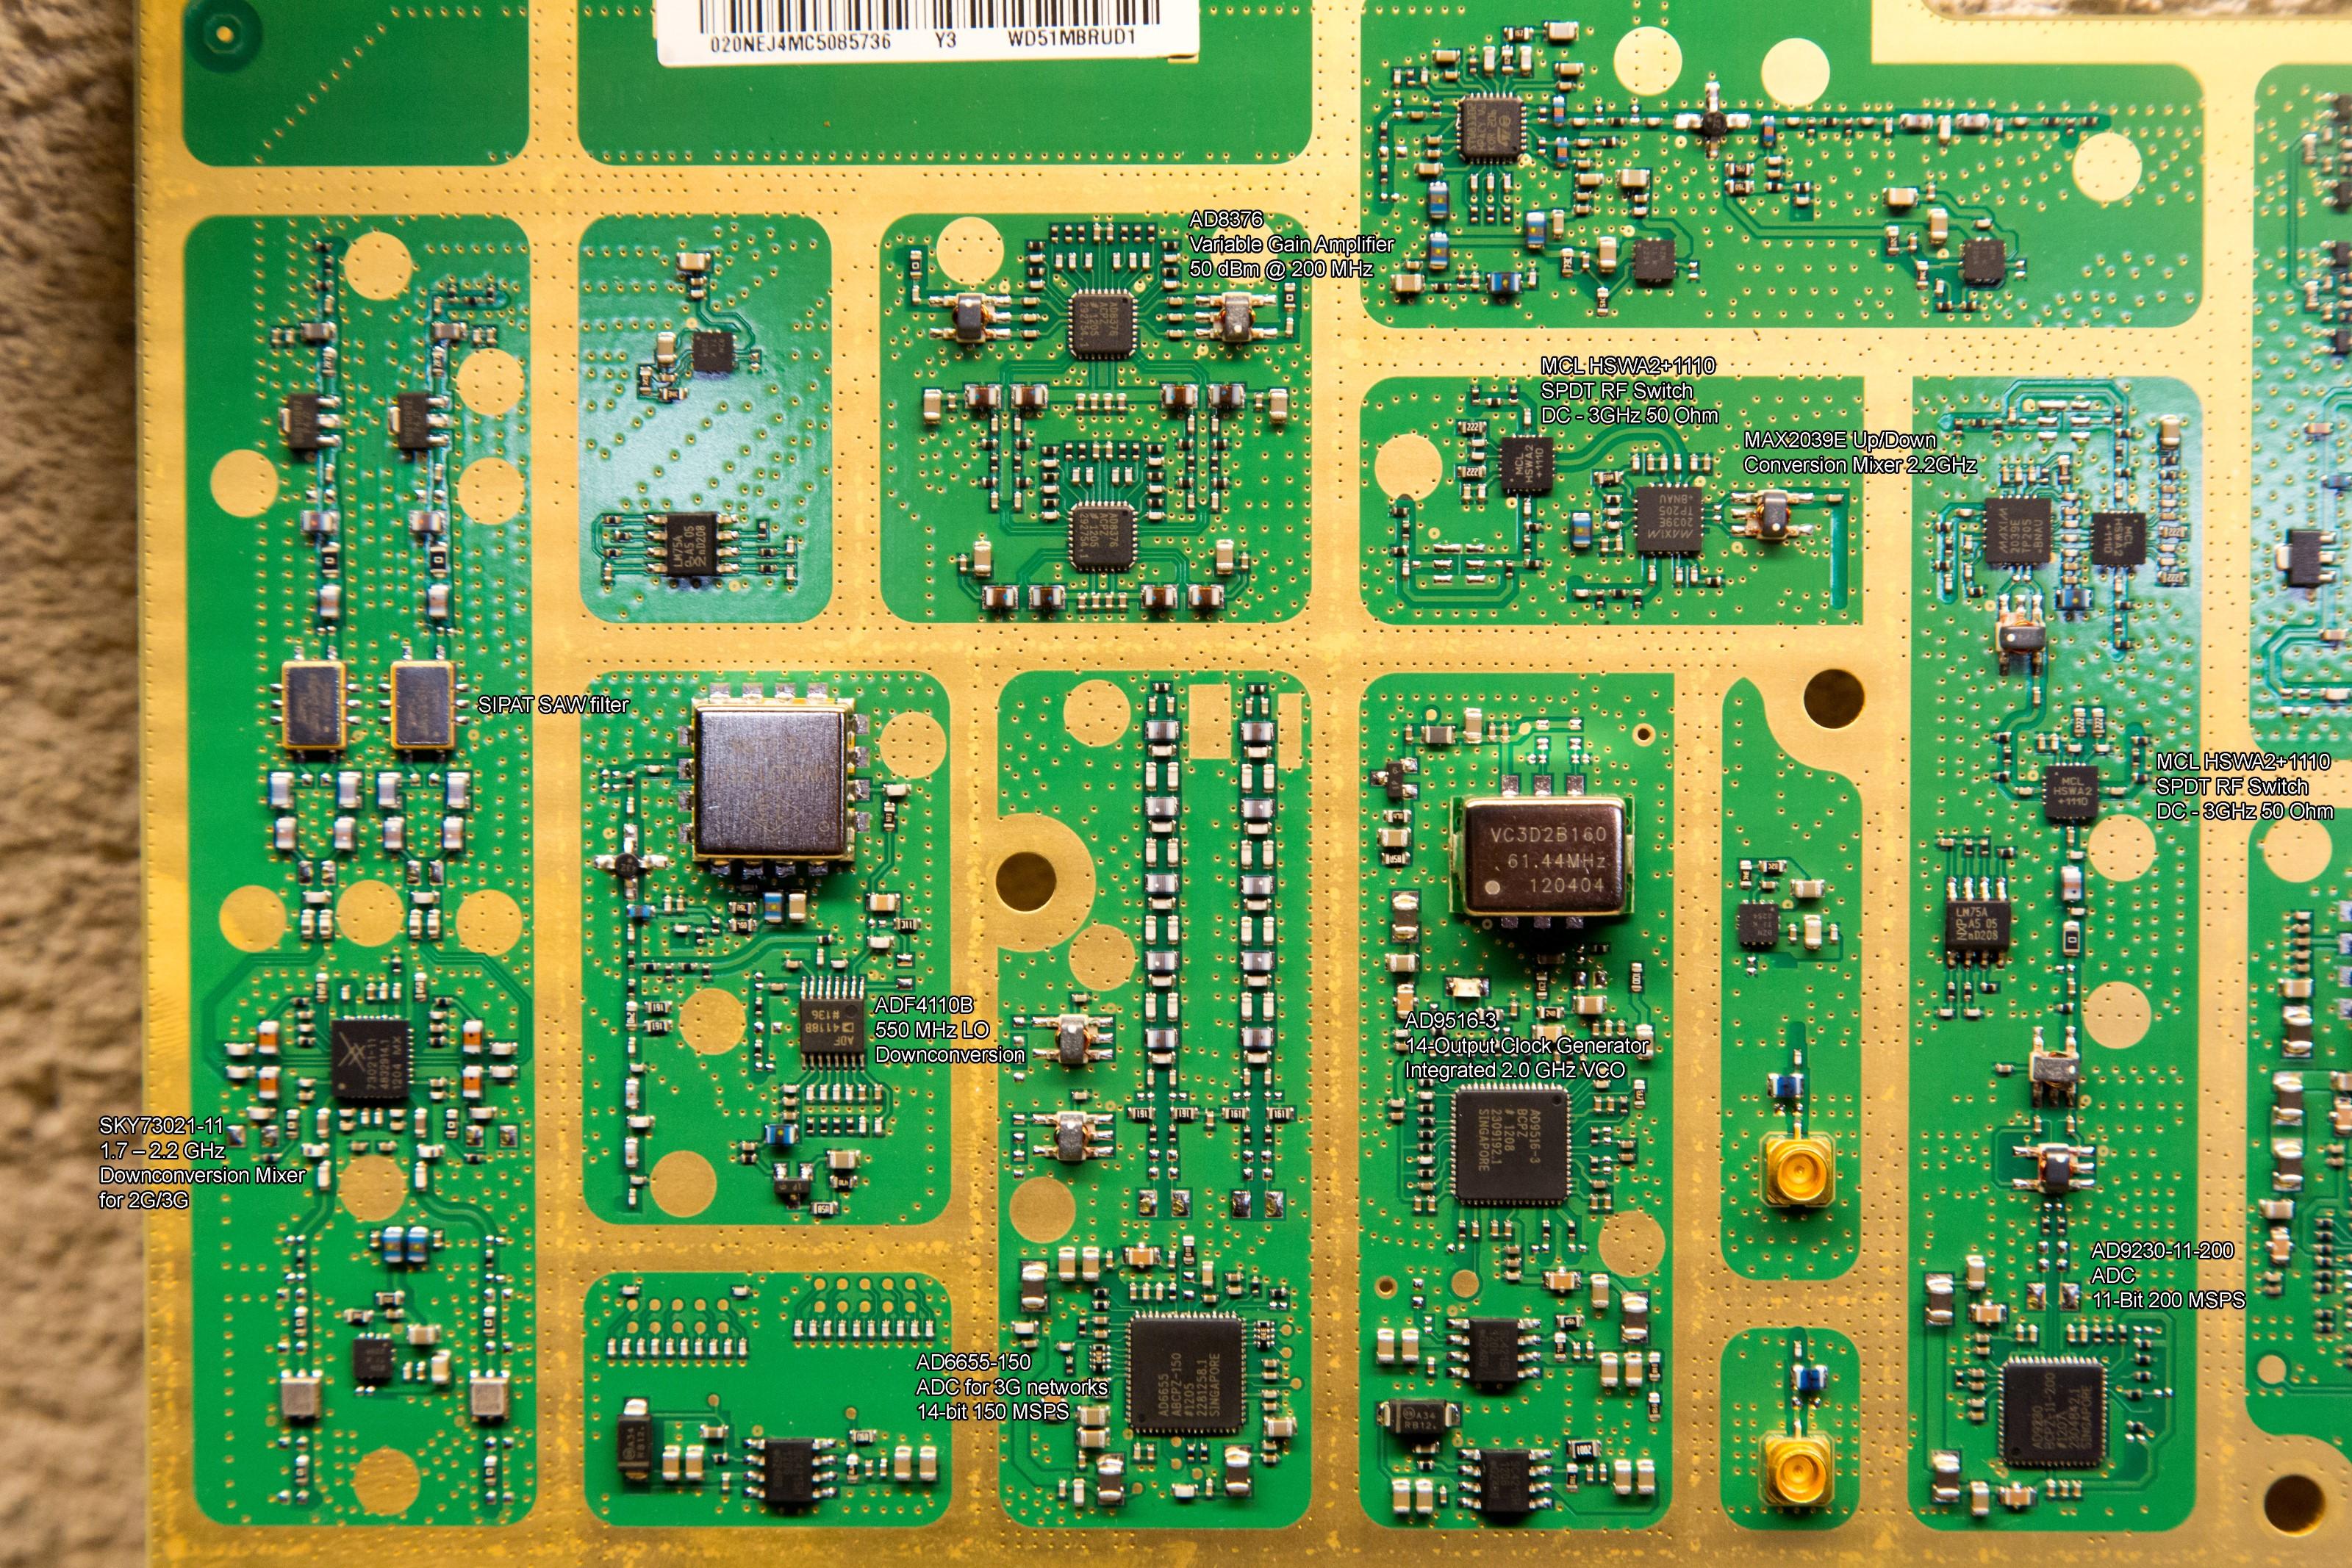 Huawei Rru3908 Base Station Circuit Analysis Part 2 Of Kaizer Gs6a4798 Text